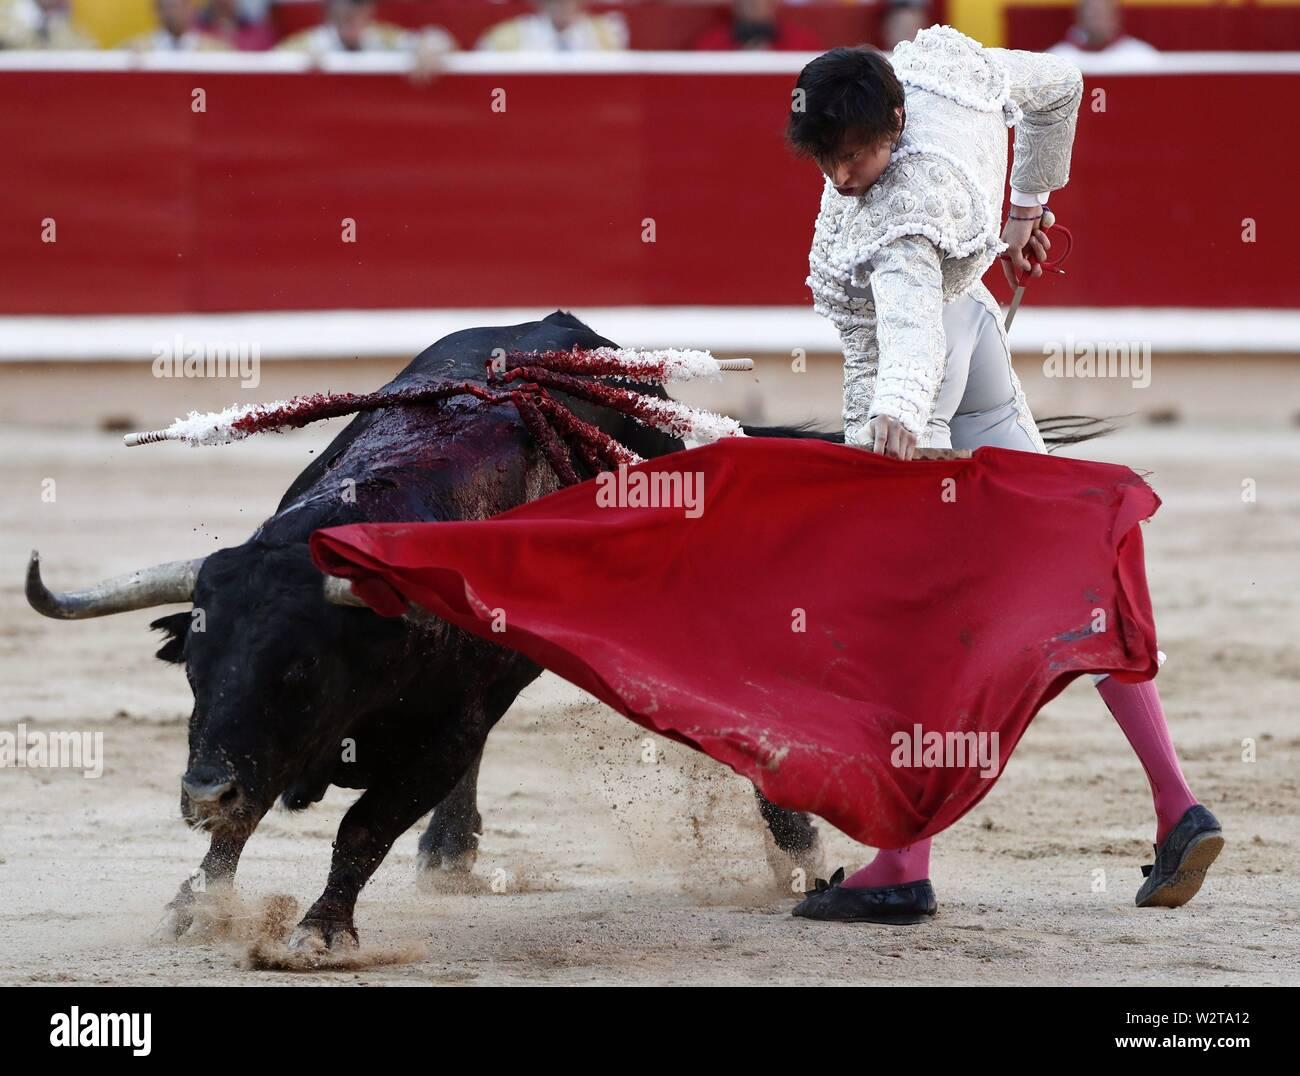 Pamplona, Spain  10th July, 2019  Peruvian bullfighter Andres Roca